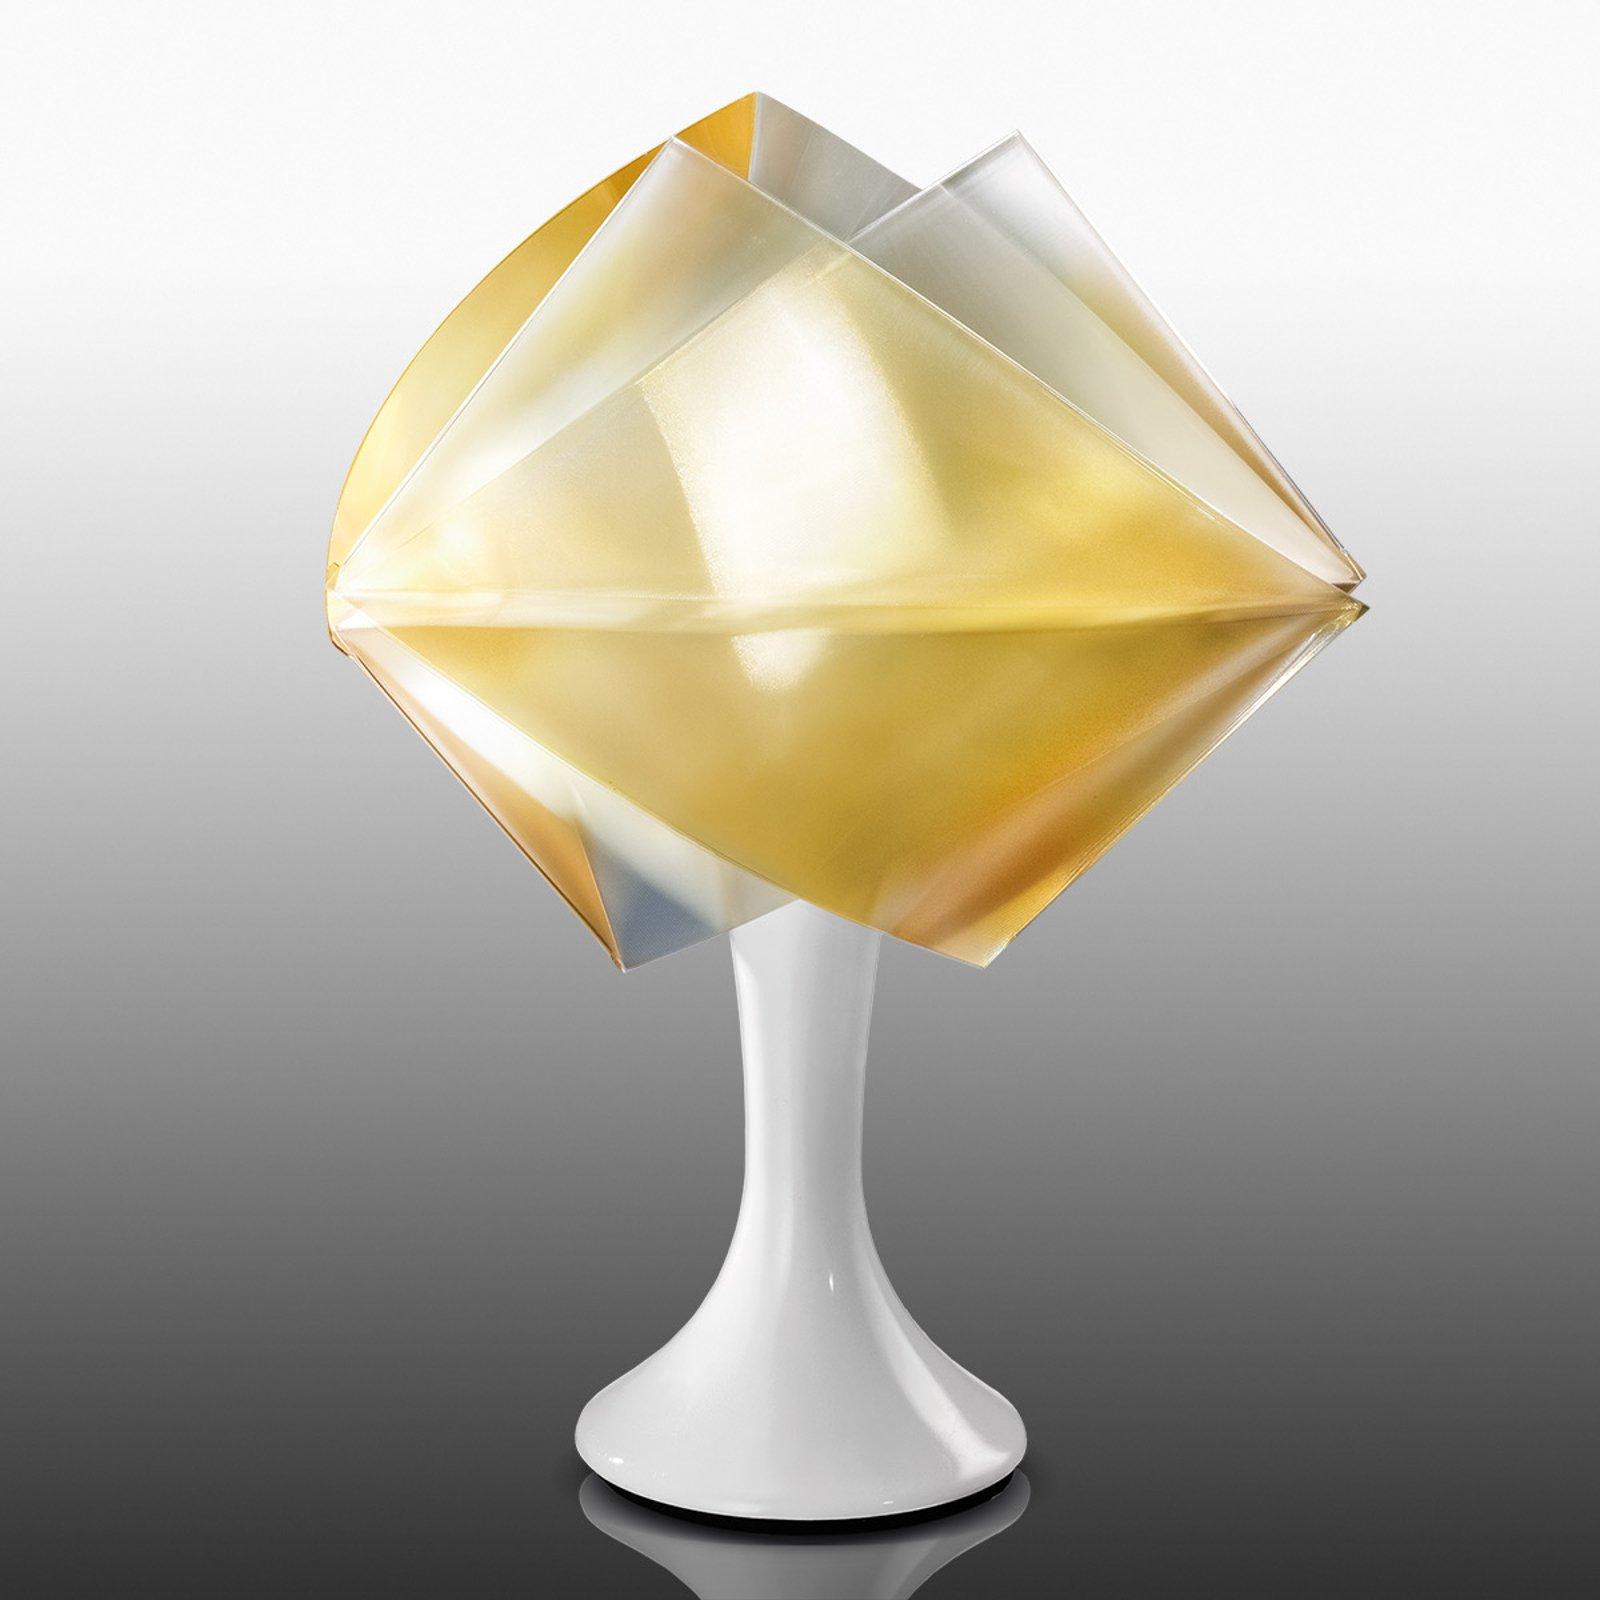 Gullfarget bordlampe Gemmy Prisma